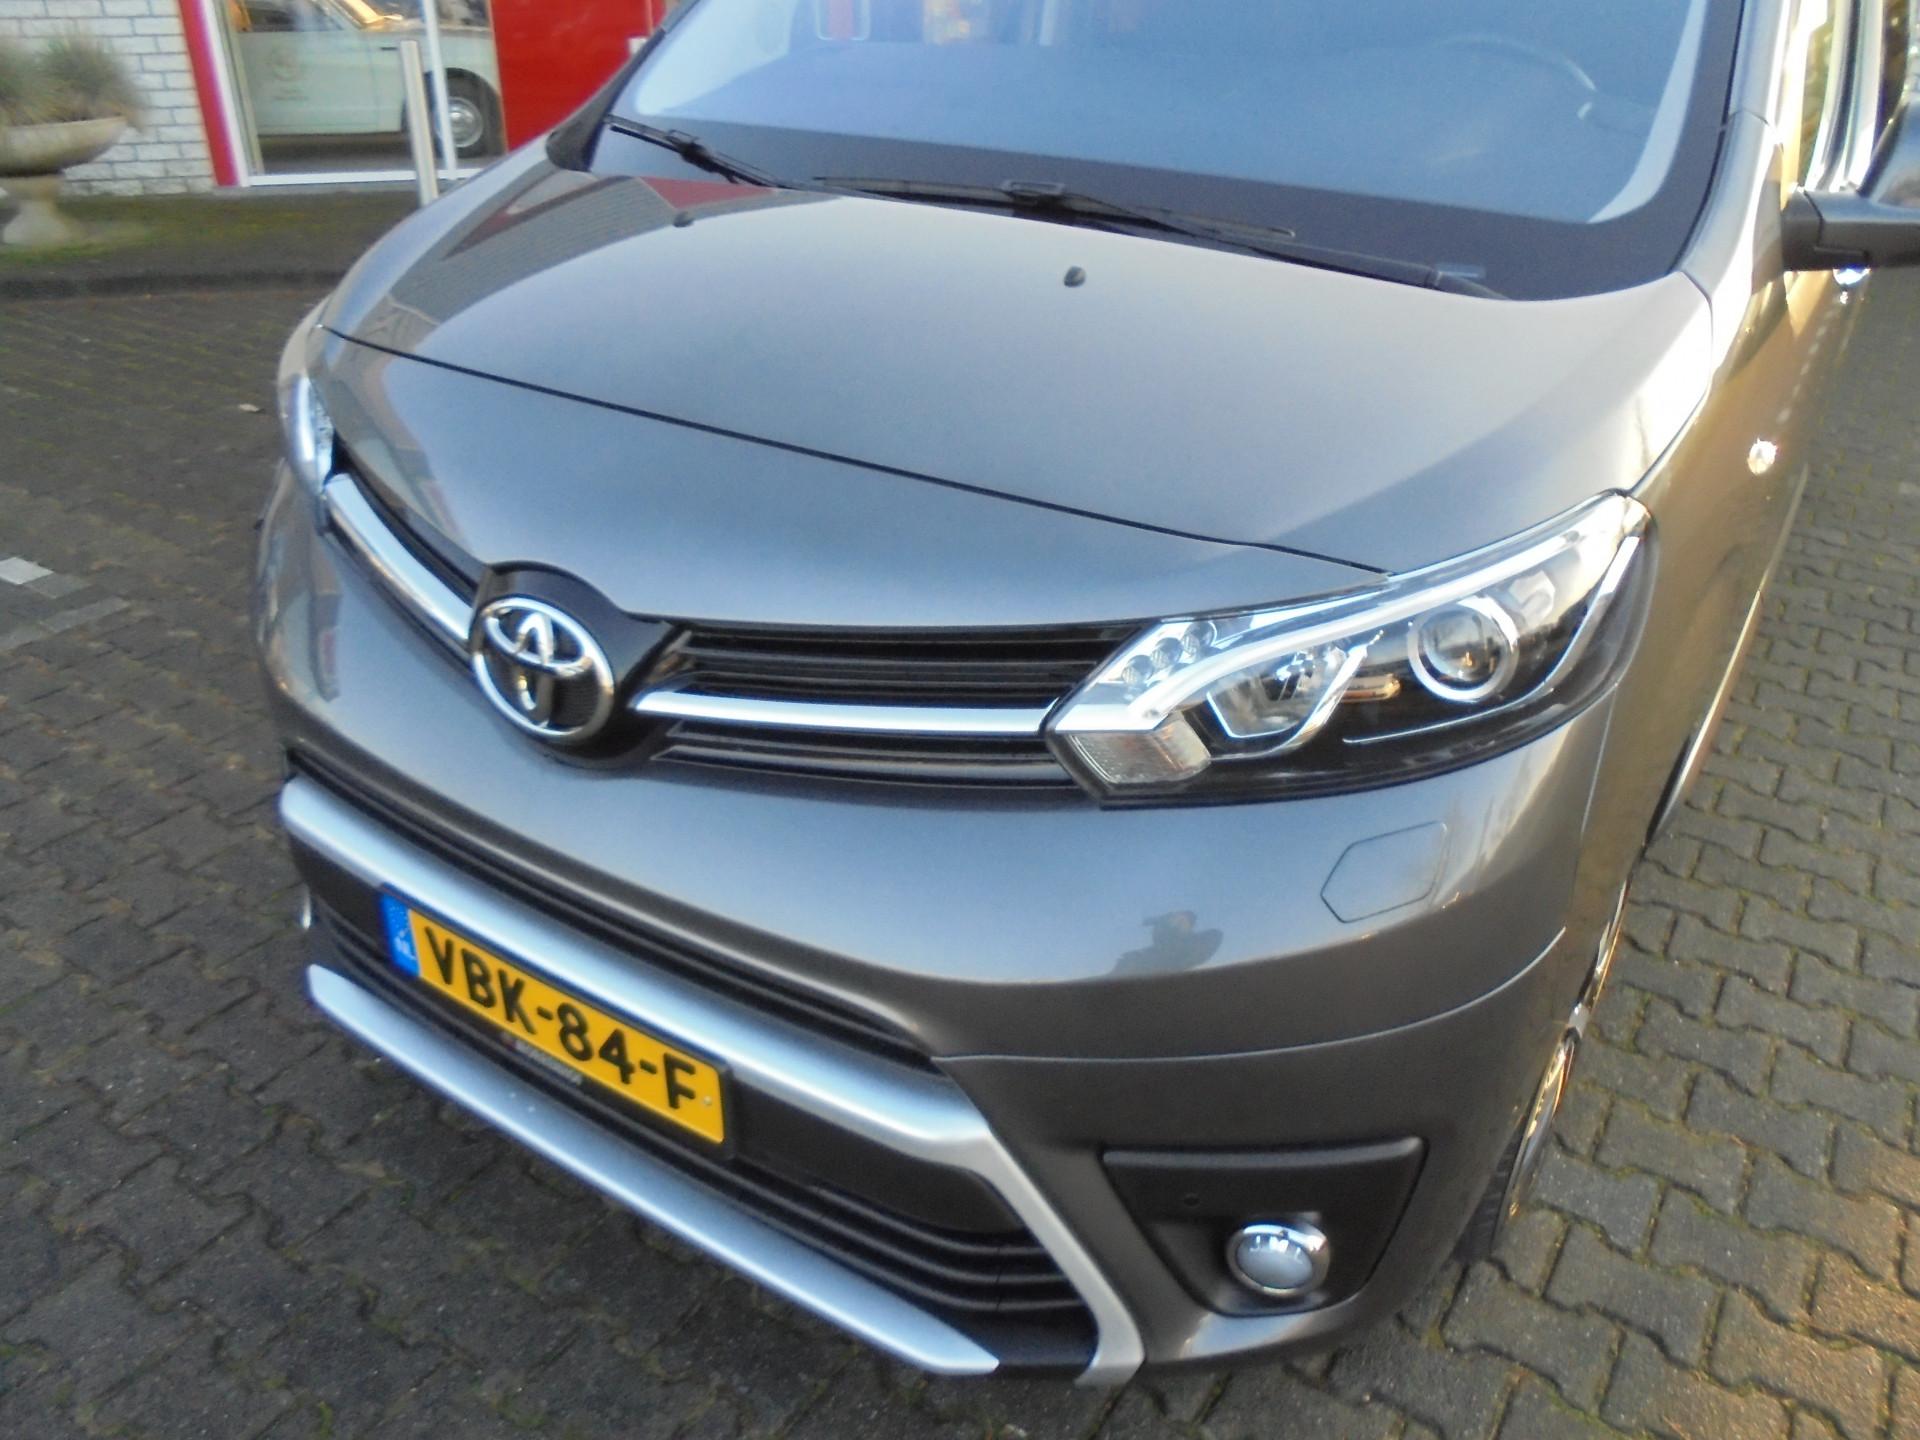 Toyota ProAce Worker bouwjaar 2019 va € 651,- pm - onlineautoleasen.nl T. 0316 - 84 72 72